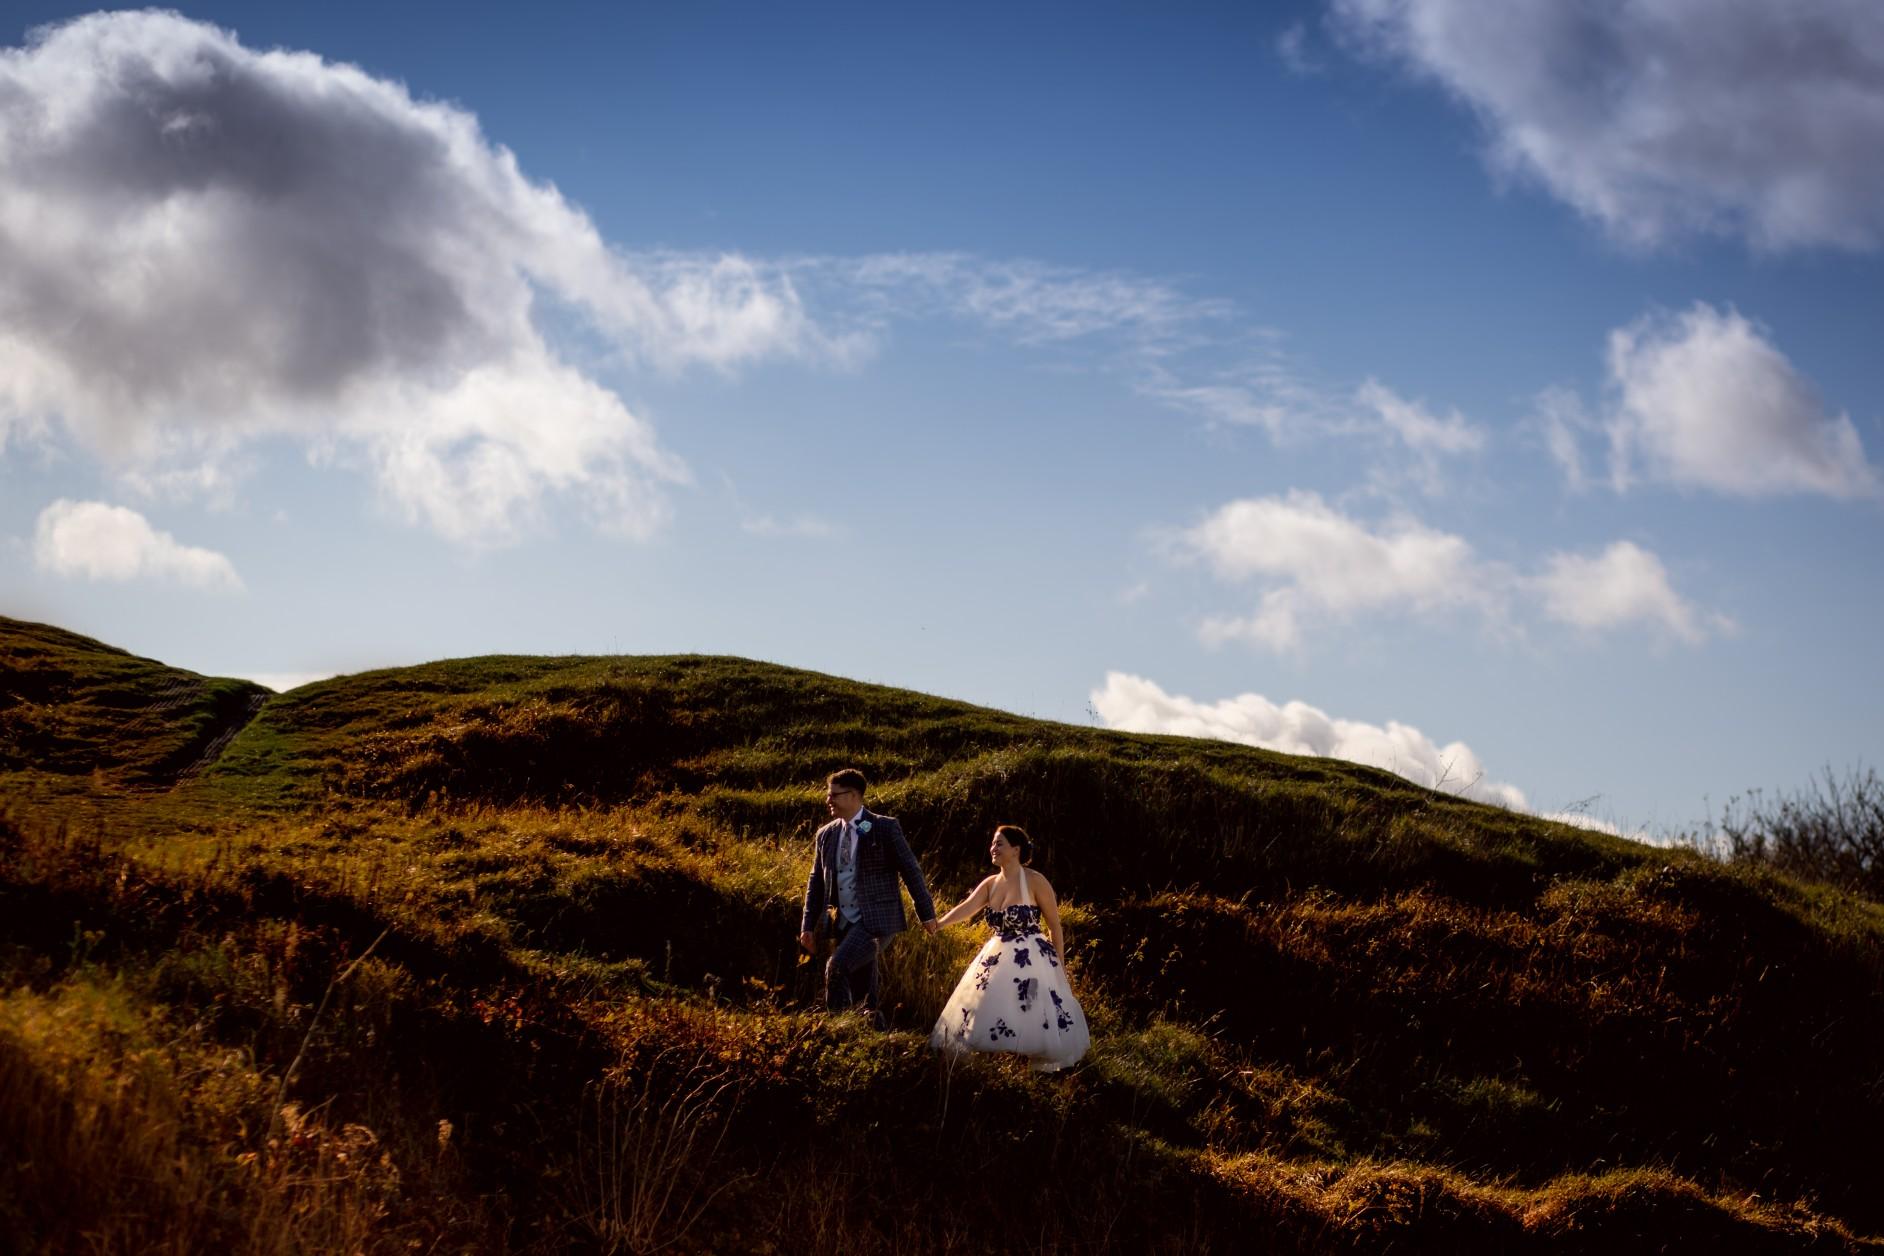 artistic wedding photos - cotswolds wedding - micro wedding inspiration